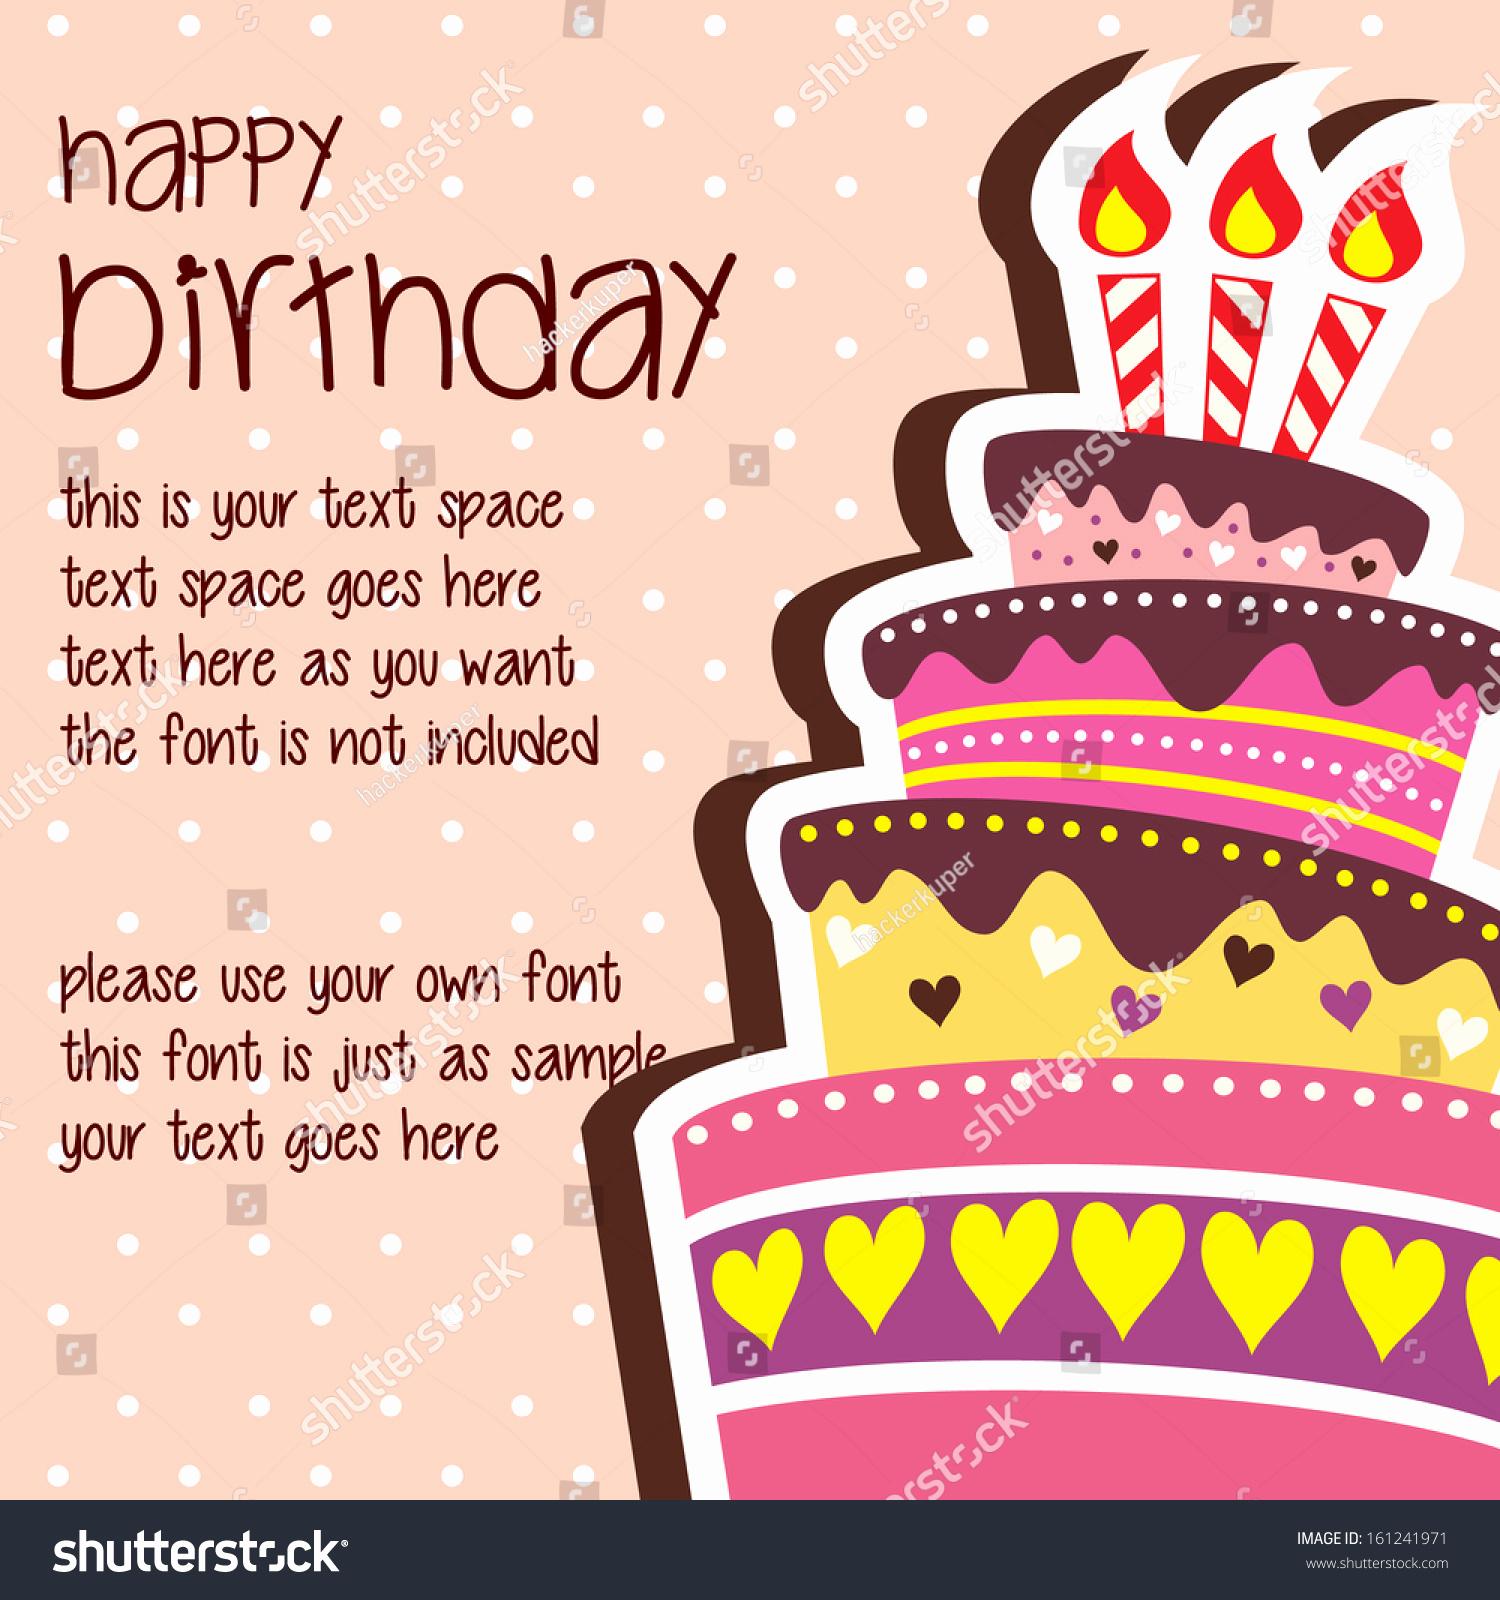 Happy Birthday Card Template Lovely Birthday Card Template